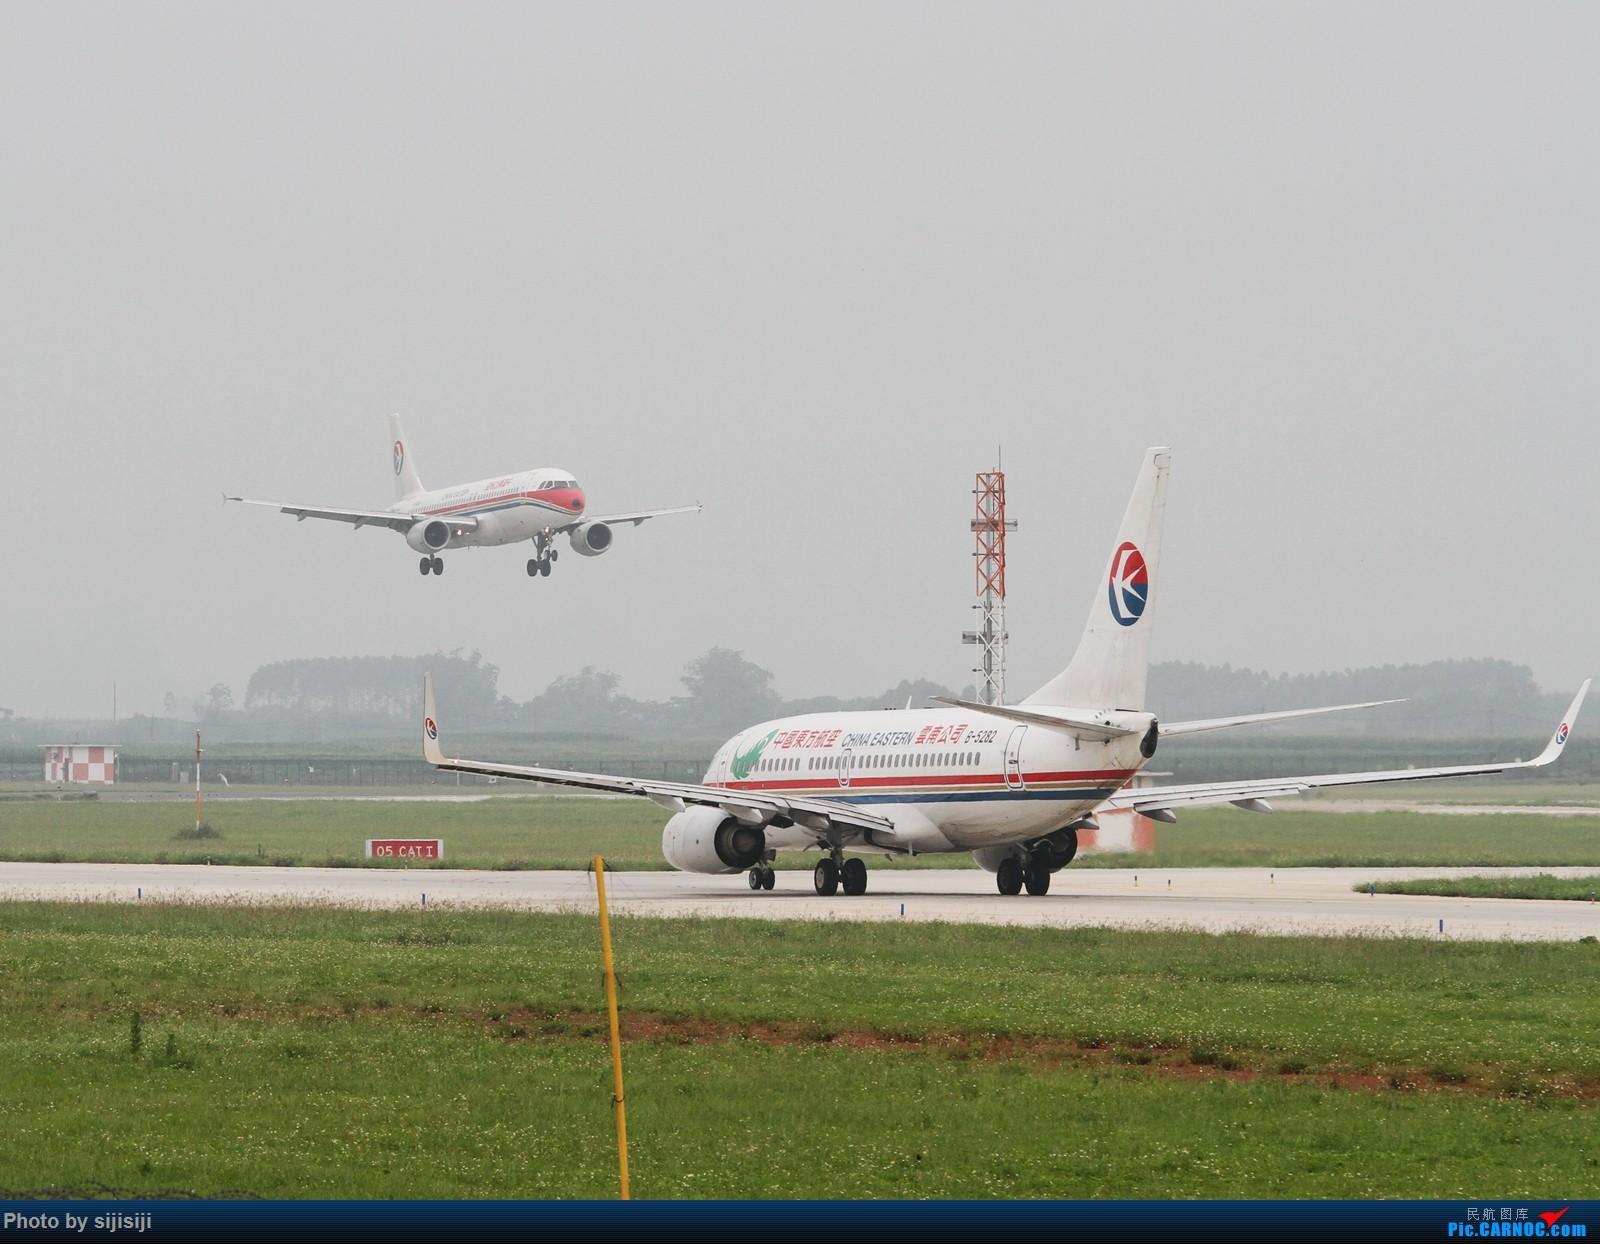 Re:[原创]【NNG飞友】屌丝村口迎来金凤凰,国航332飞抵NNG AIRBUS A320-200 B-2220 中国南宁吴圩国际机场